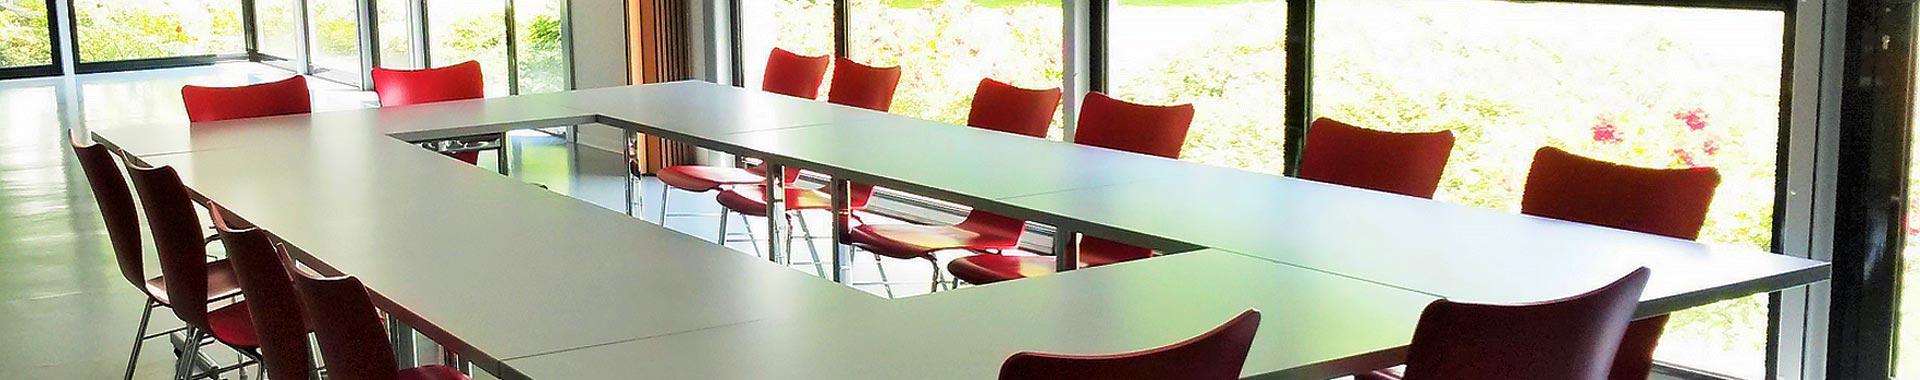 Salle réunion organisation séminaire Auberge de Jeunesse de Mulhouse